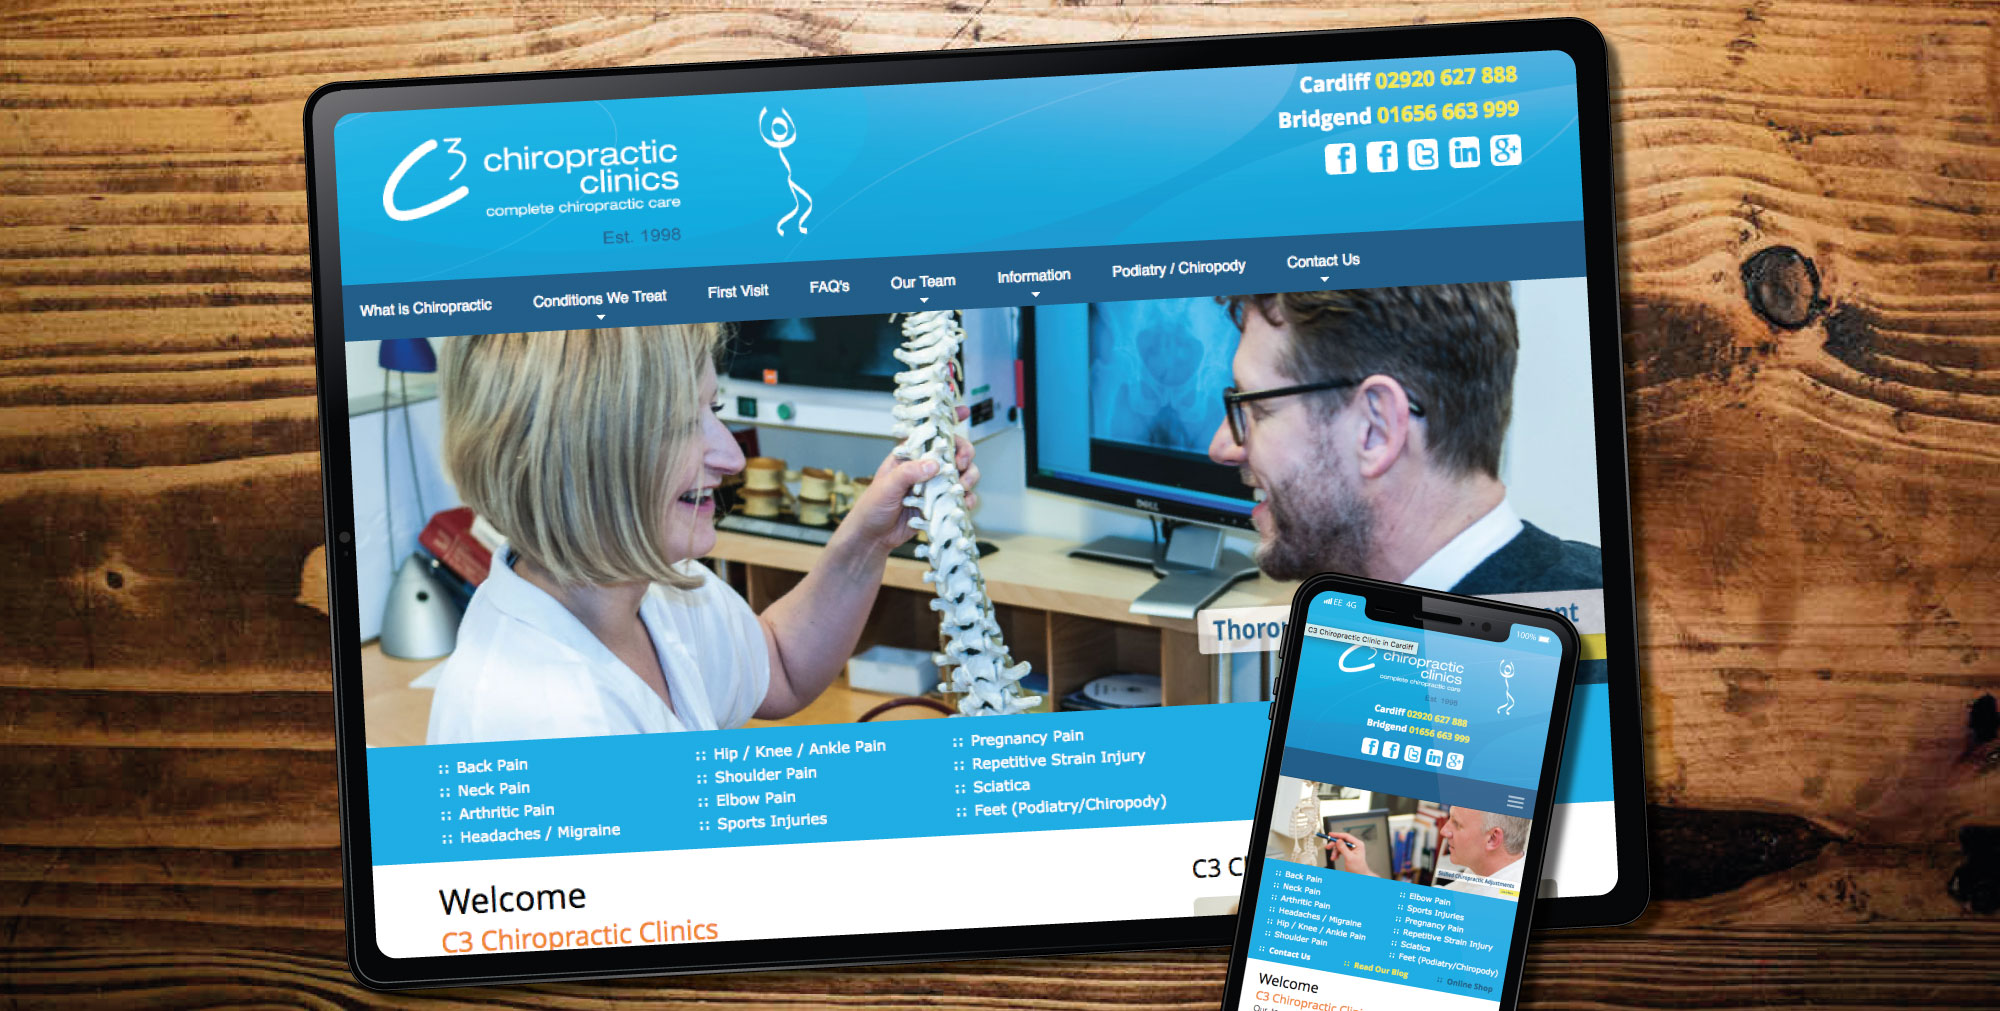 web design for chiropractor, Bridgend and Cardiff